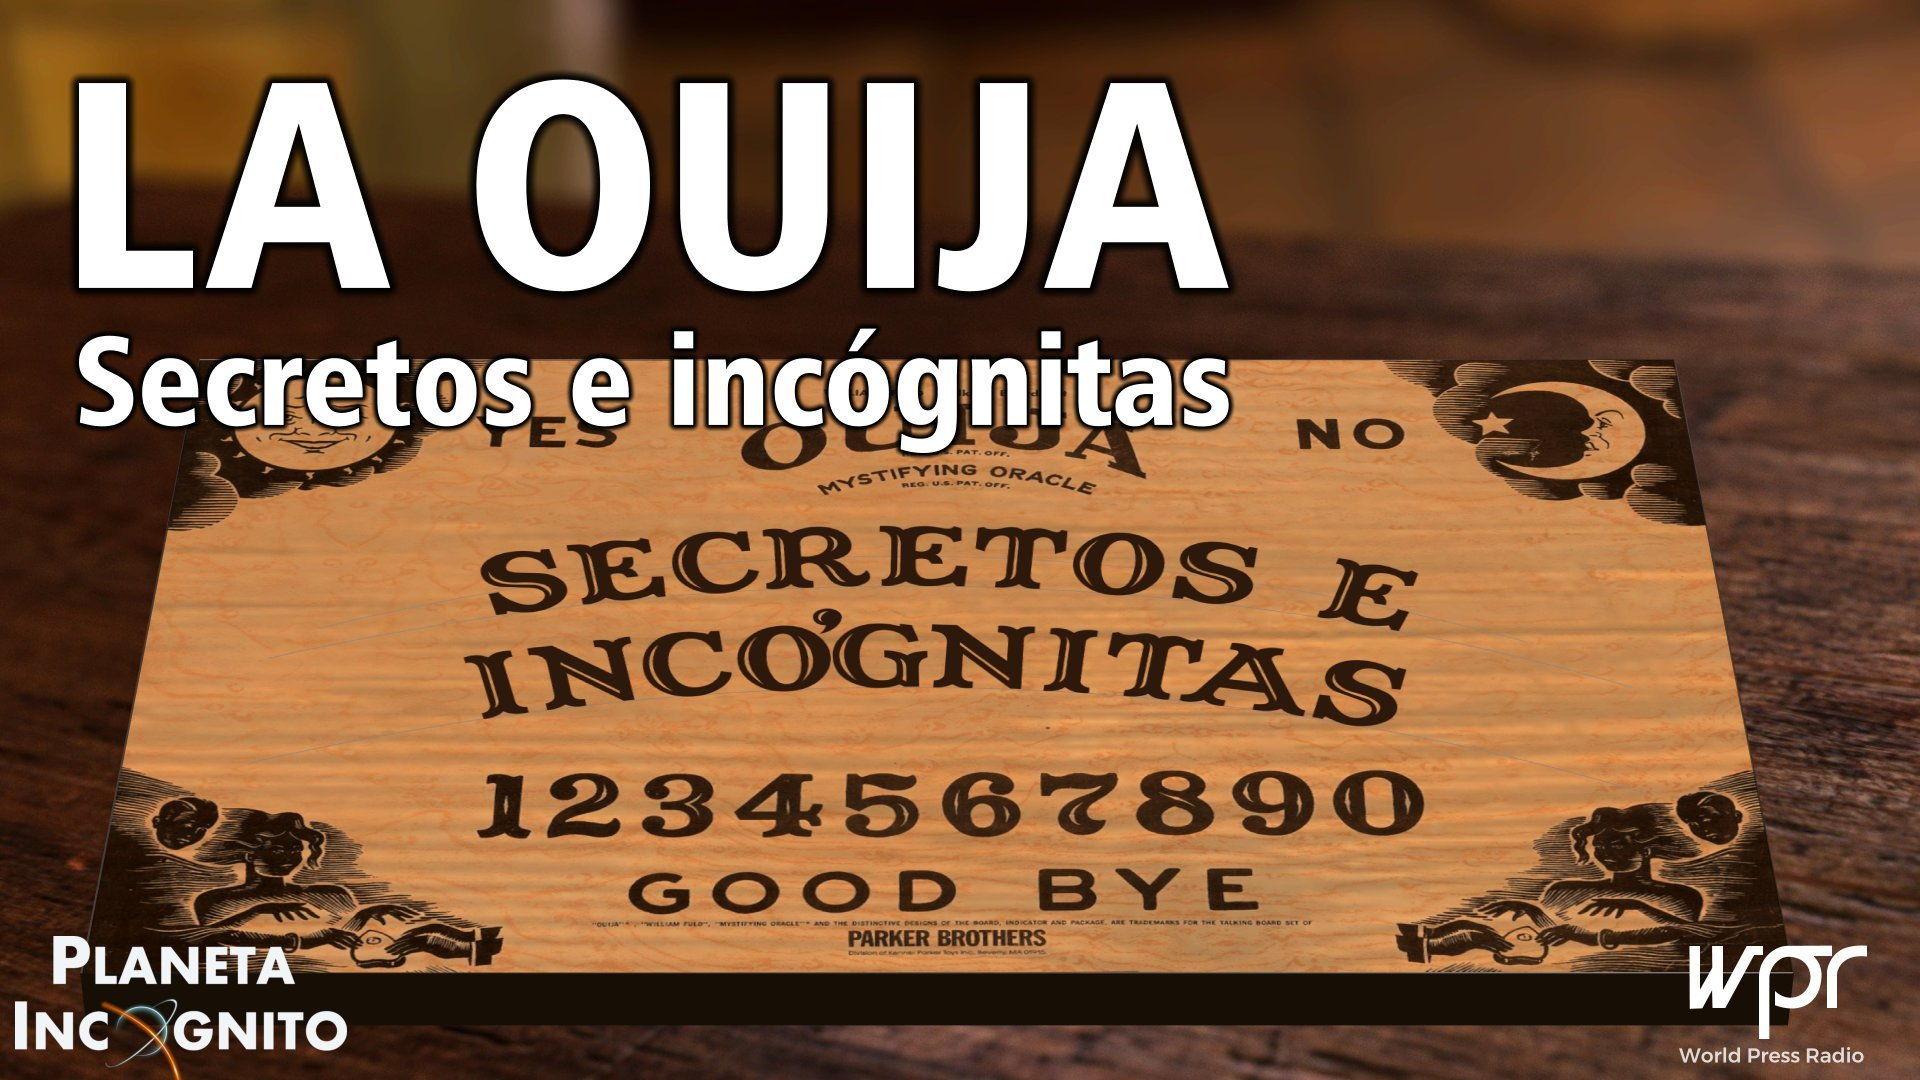 Ouija169, Planeta Incógnito